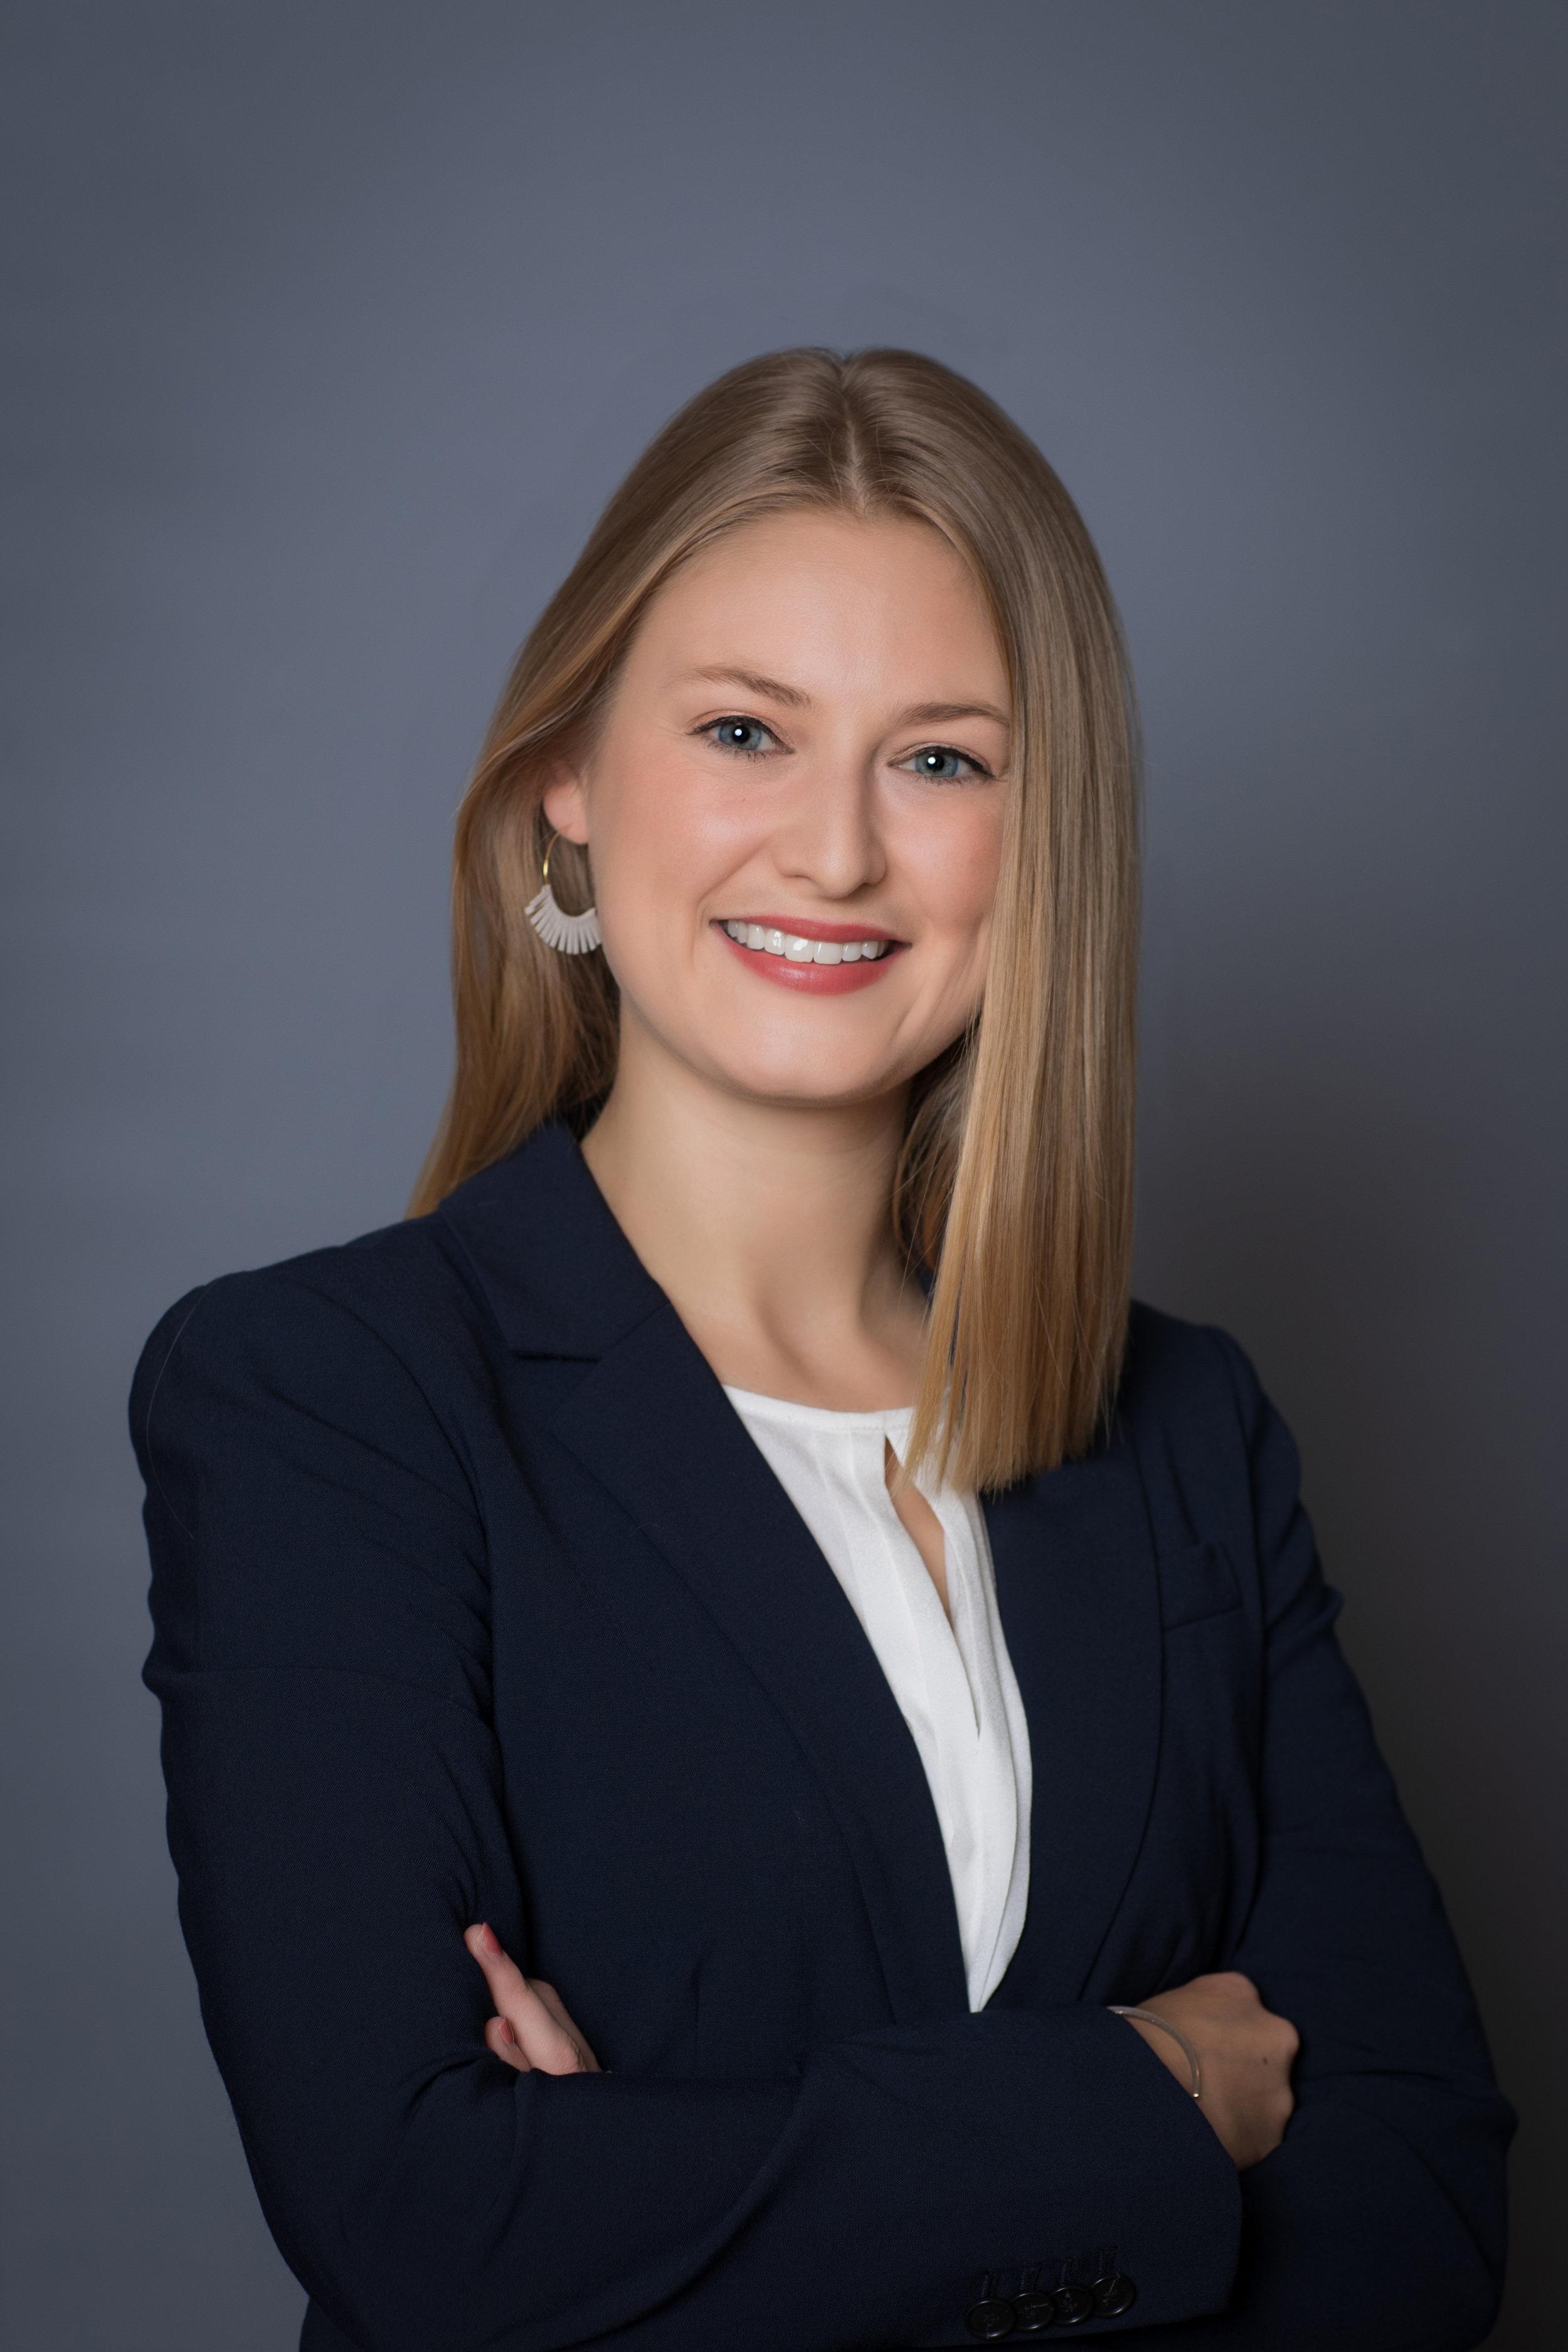 Elise Wagener, Au.D. CCC-A